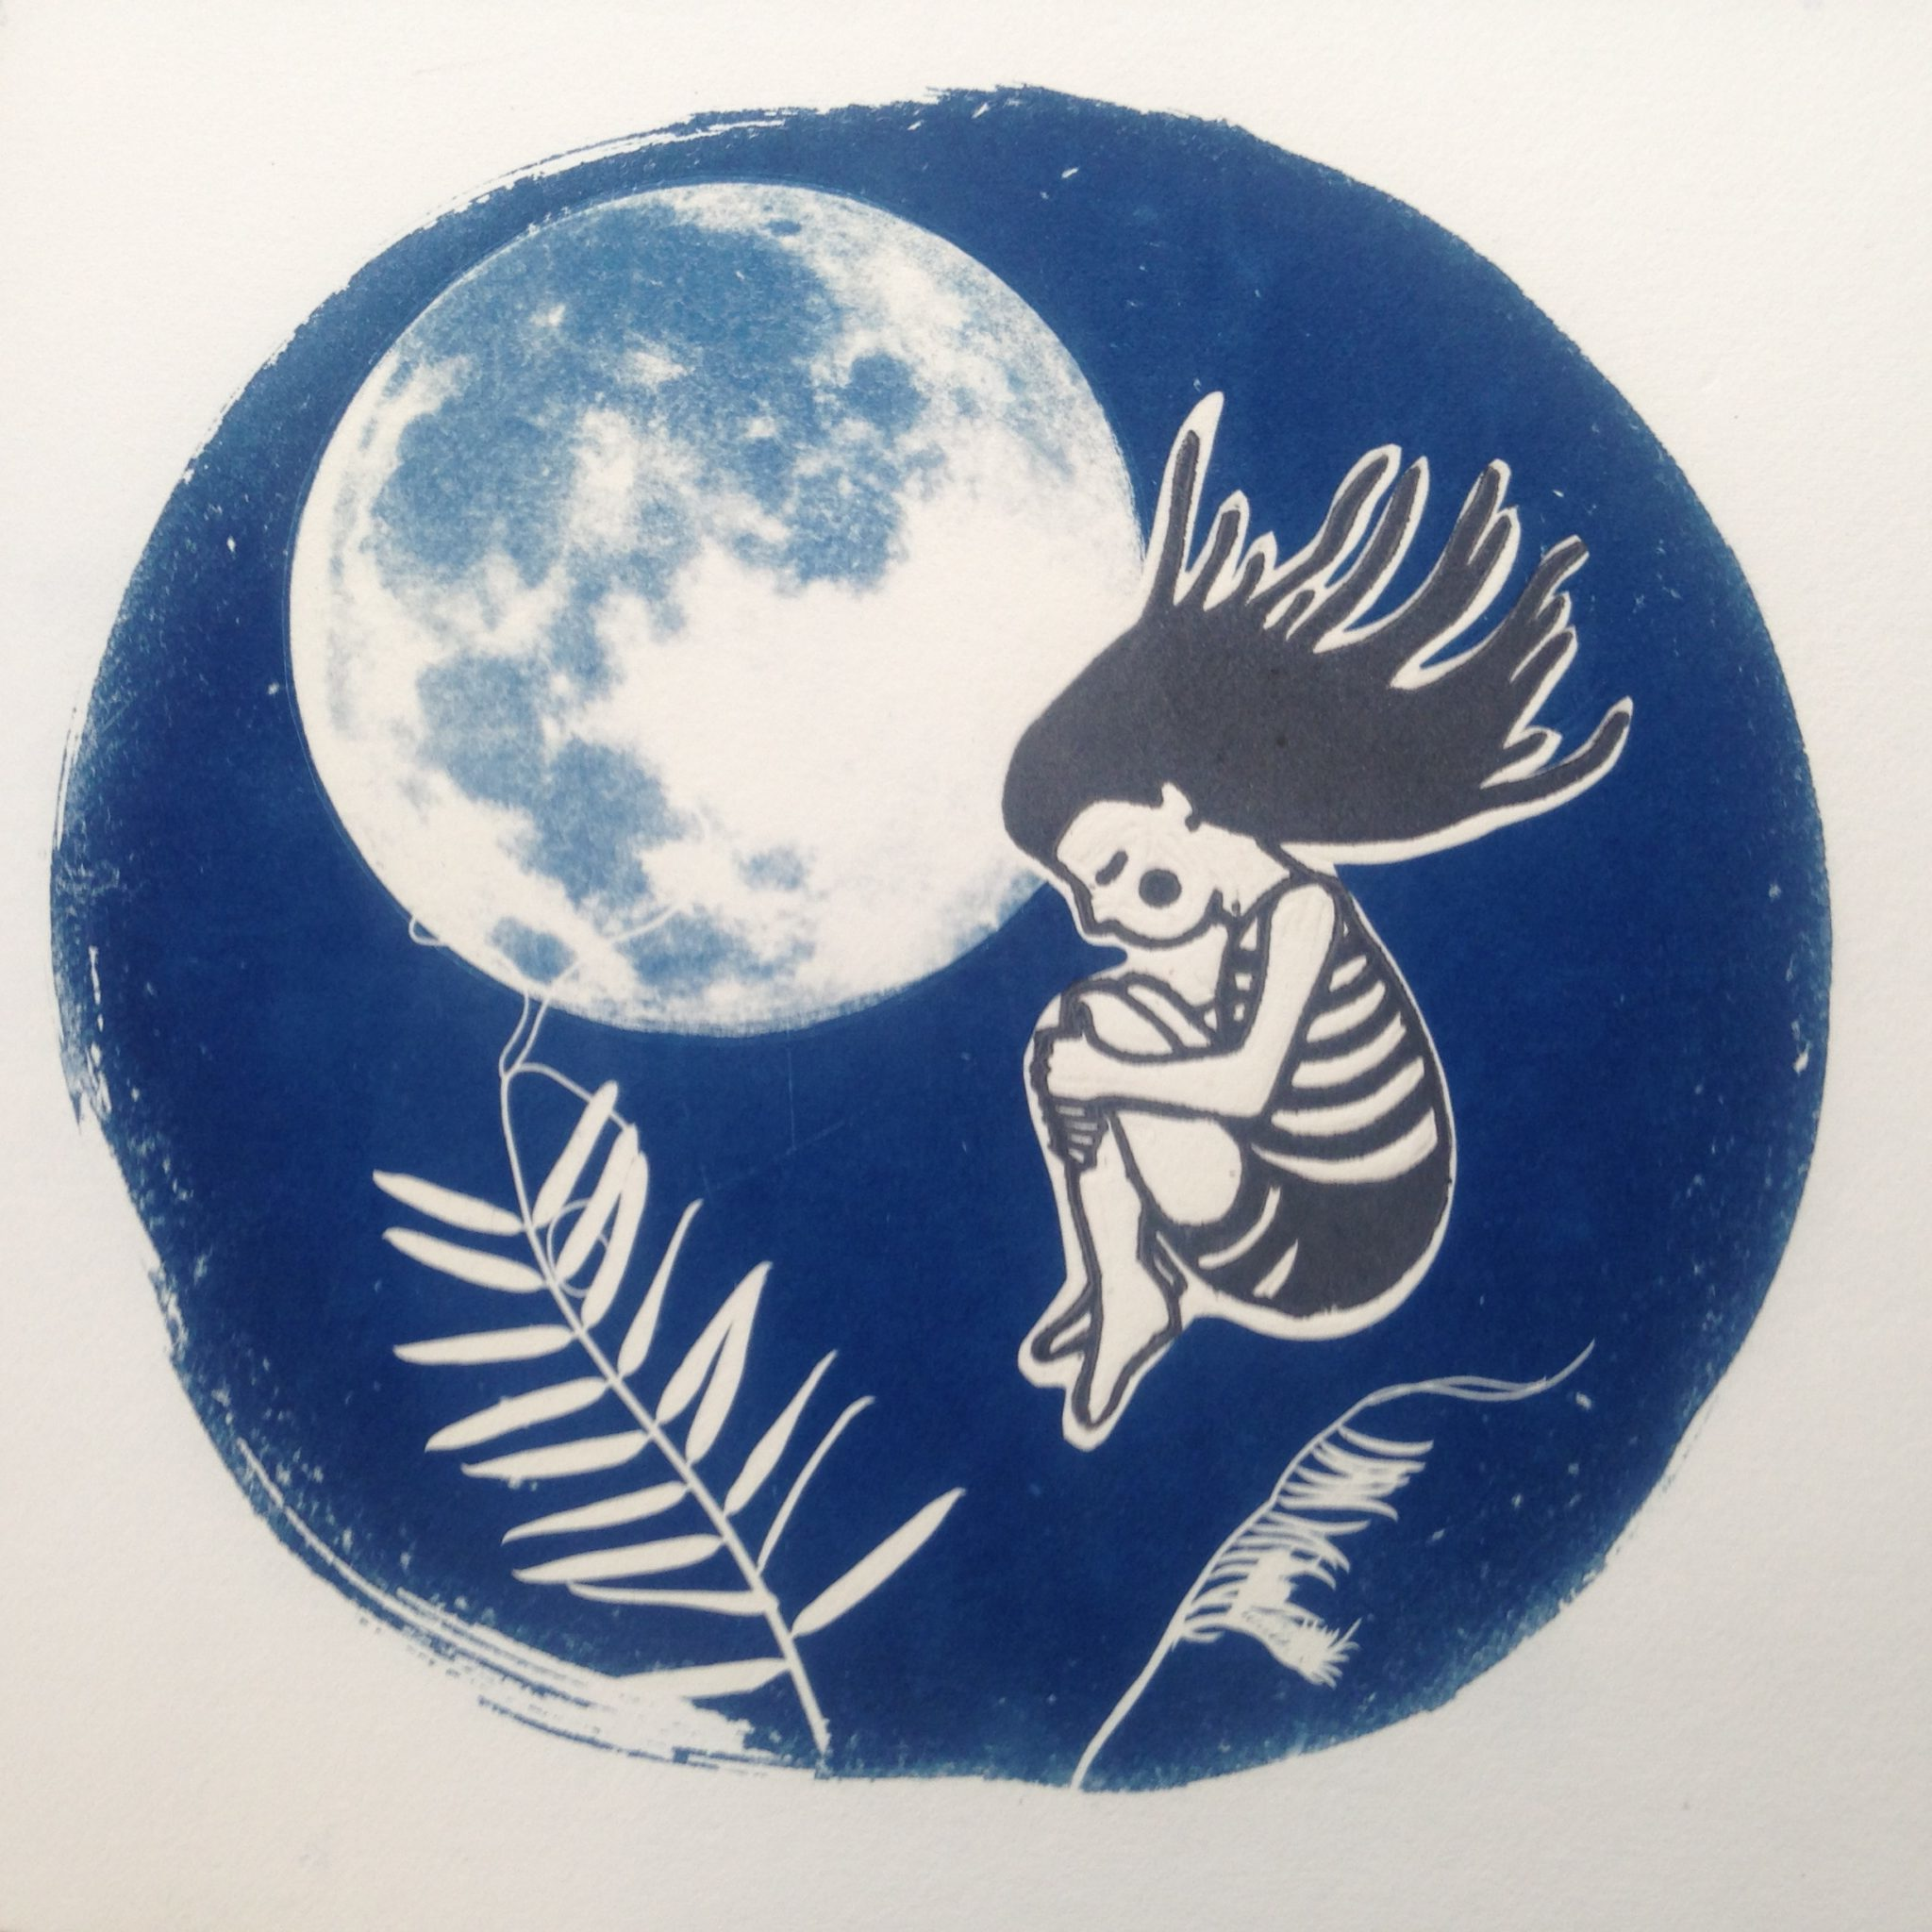 LinoLino | Linogravure et créations à partir d'impressions artisanales | Chambéry, France | Impression originale illustration cyanotype mixedmedia linocut moon